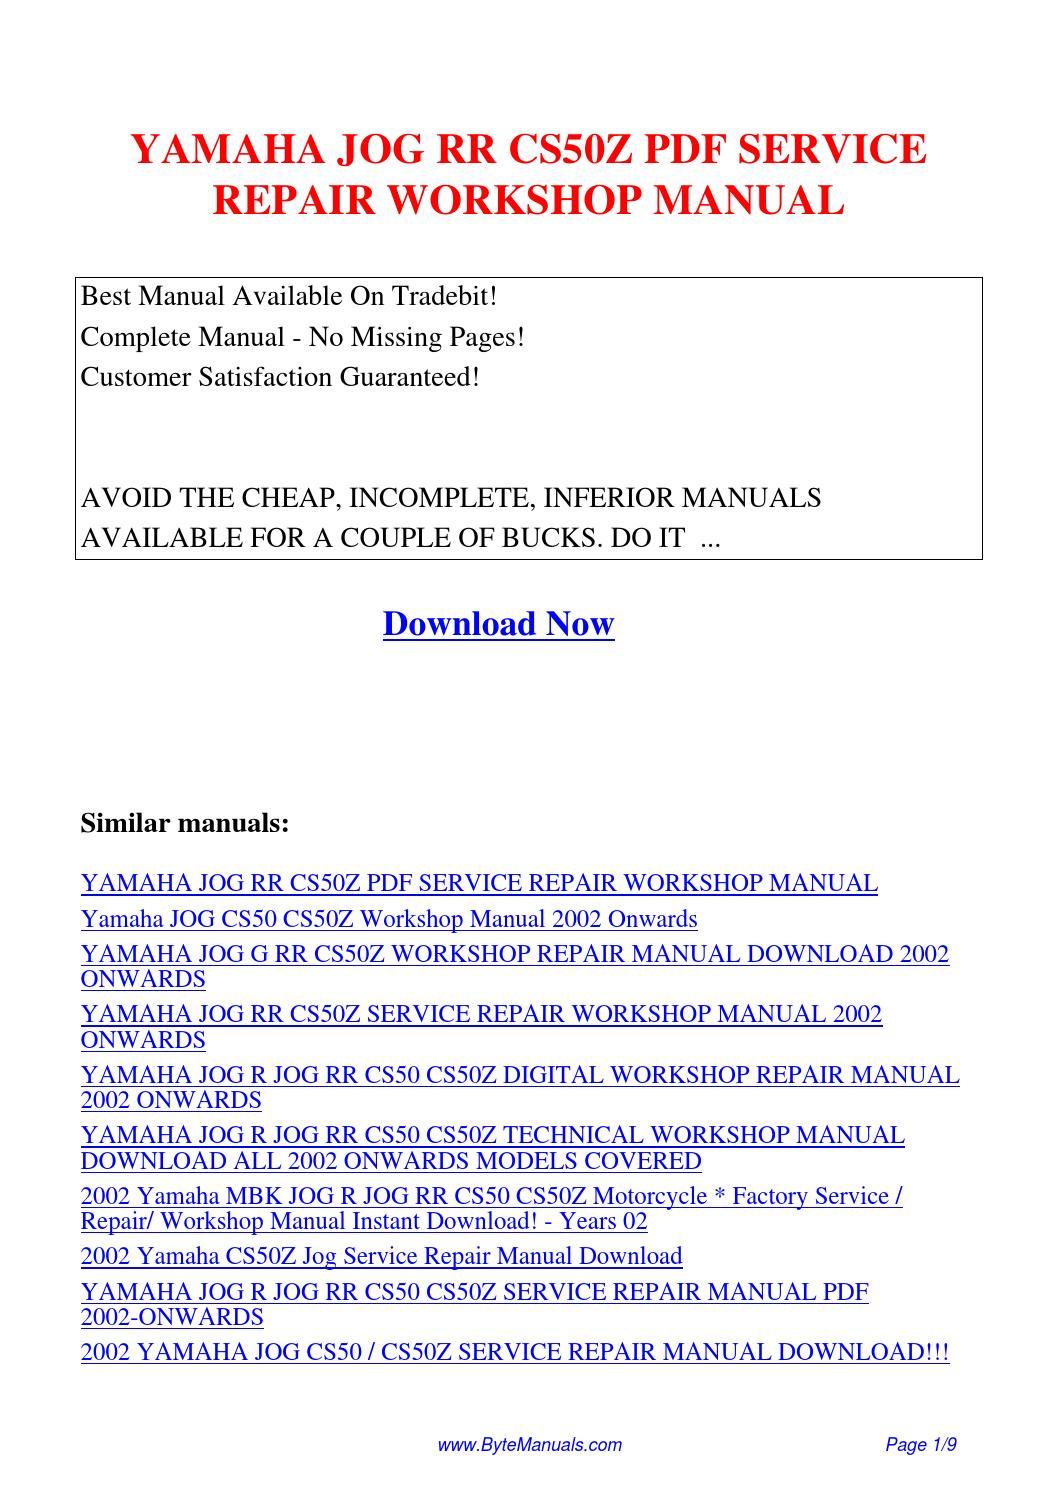 Yamaha Jog R Manual